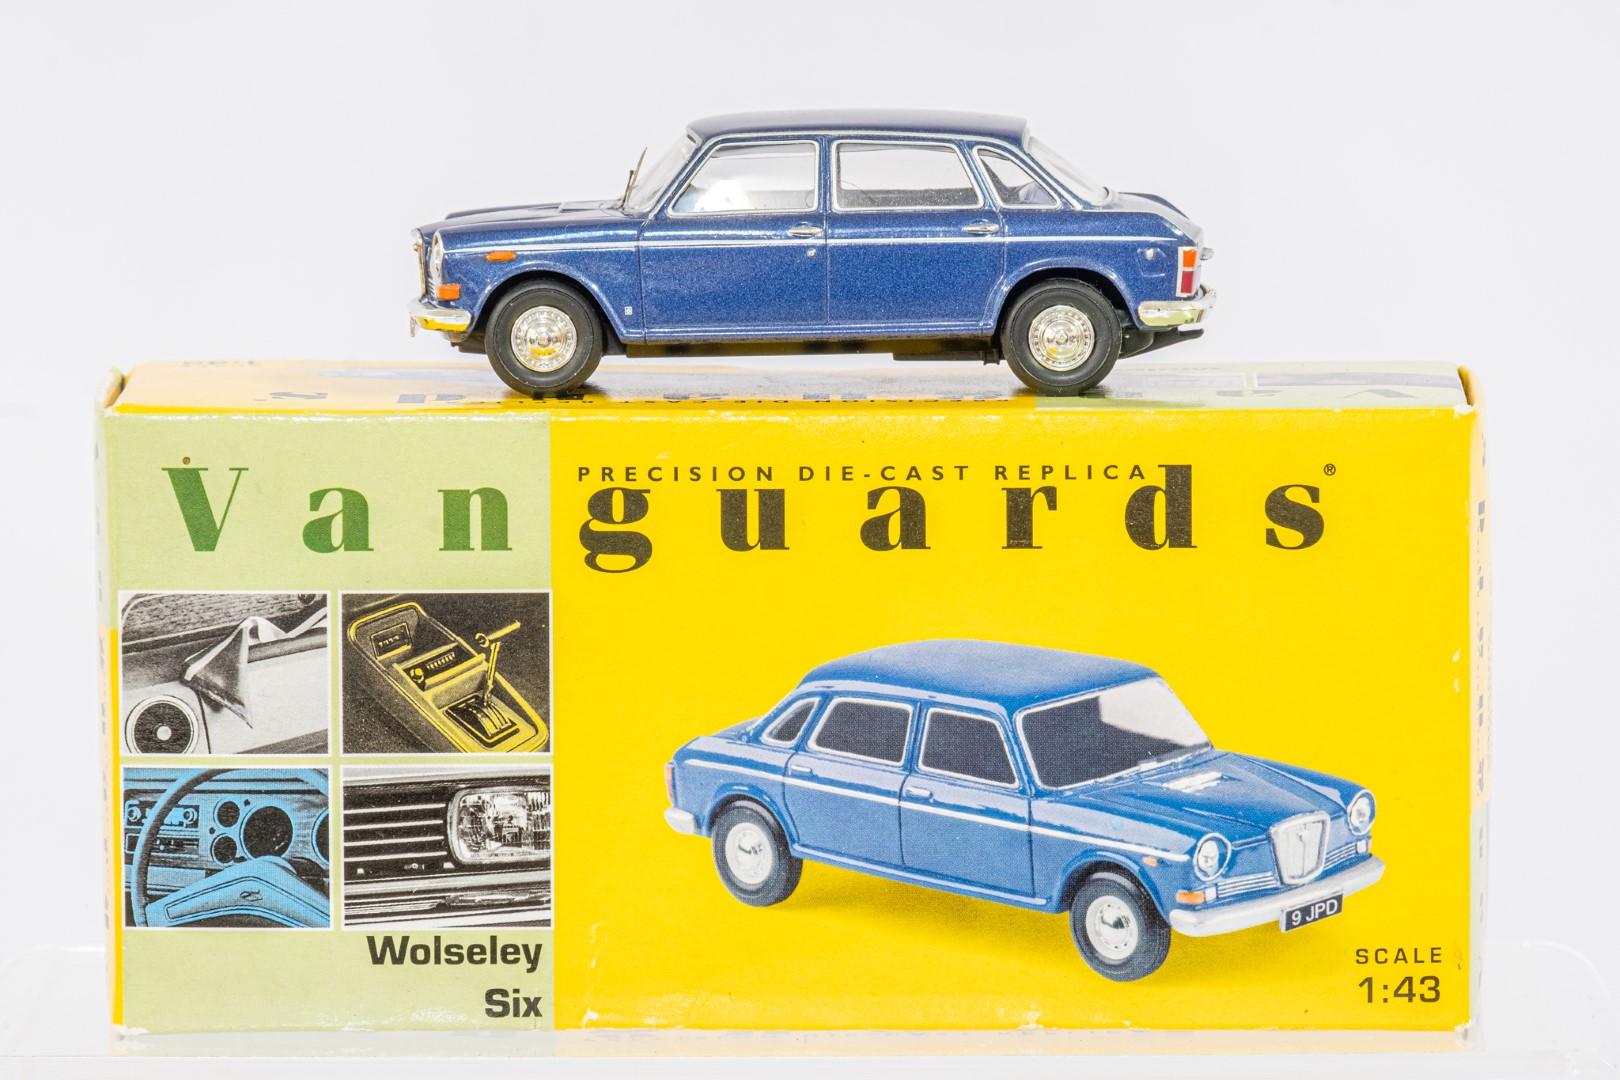 Vanguards Ford Cortina MkIV 2.0 Ghia Roman Bronze - Wolseley Six - Cosmic Blue Metallic - - Image 2 of 3